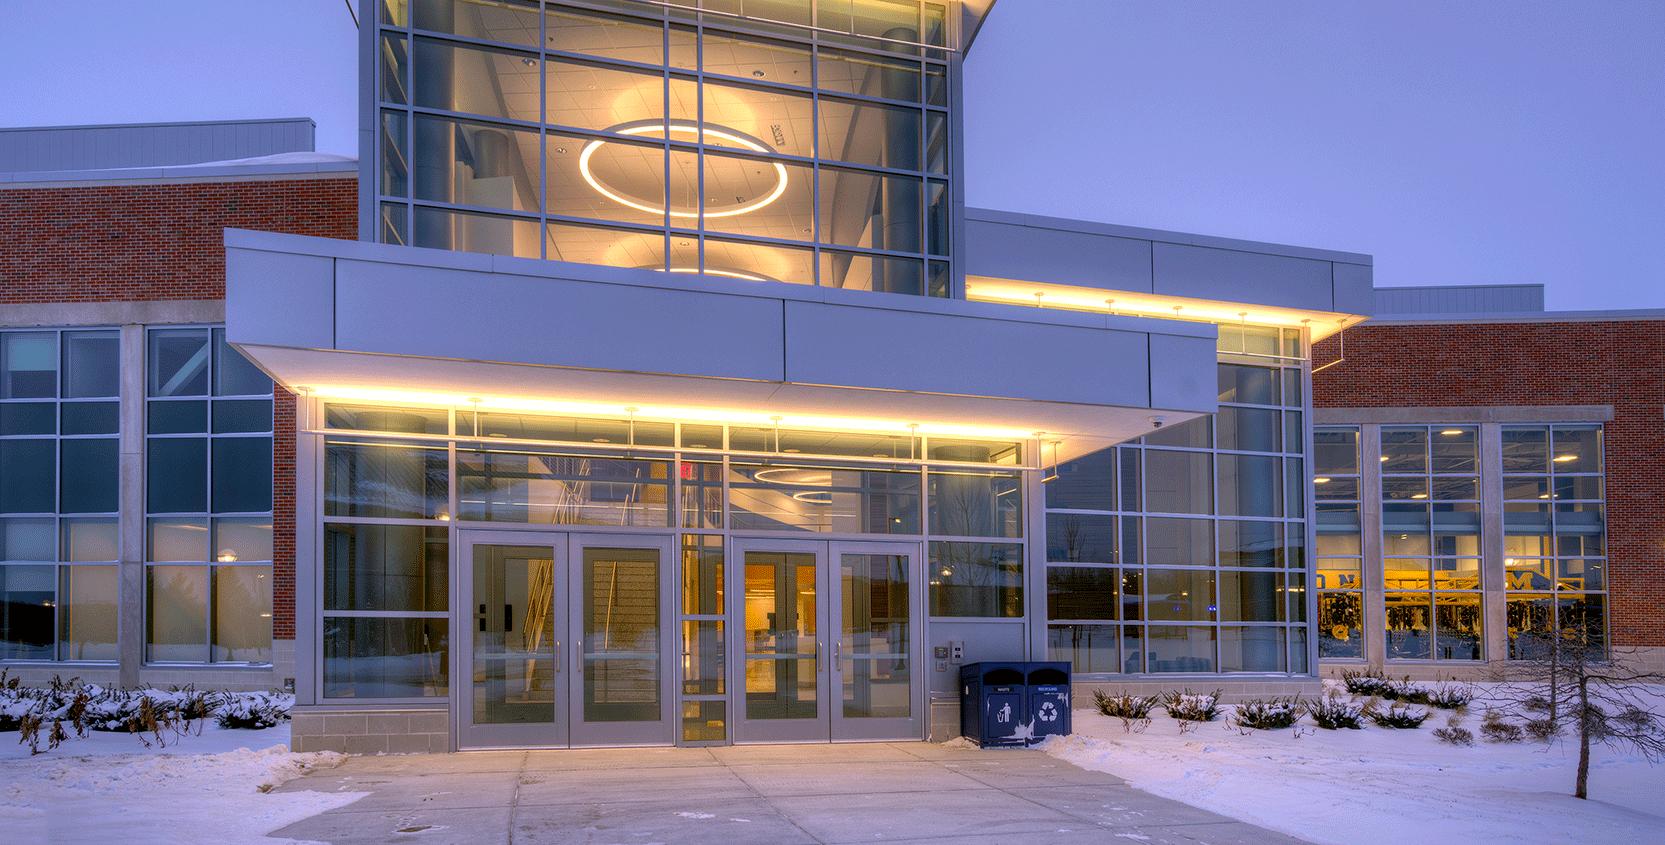 University-of-Michigan-ASCP-Exterior-Night-2-1665x845